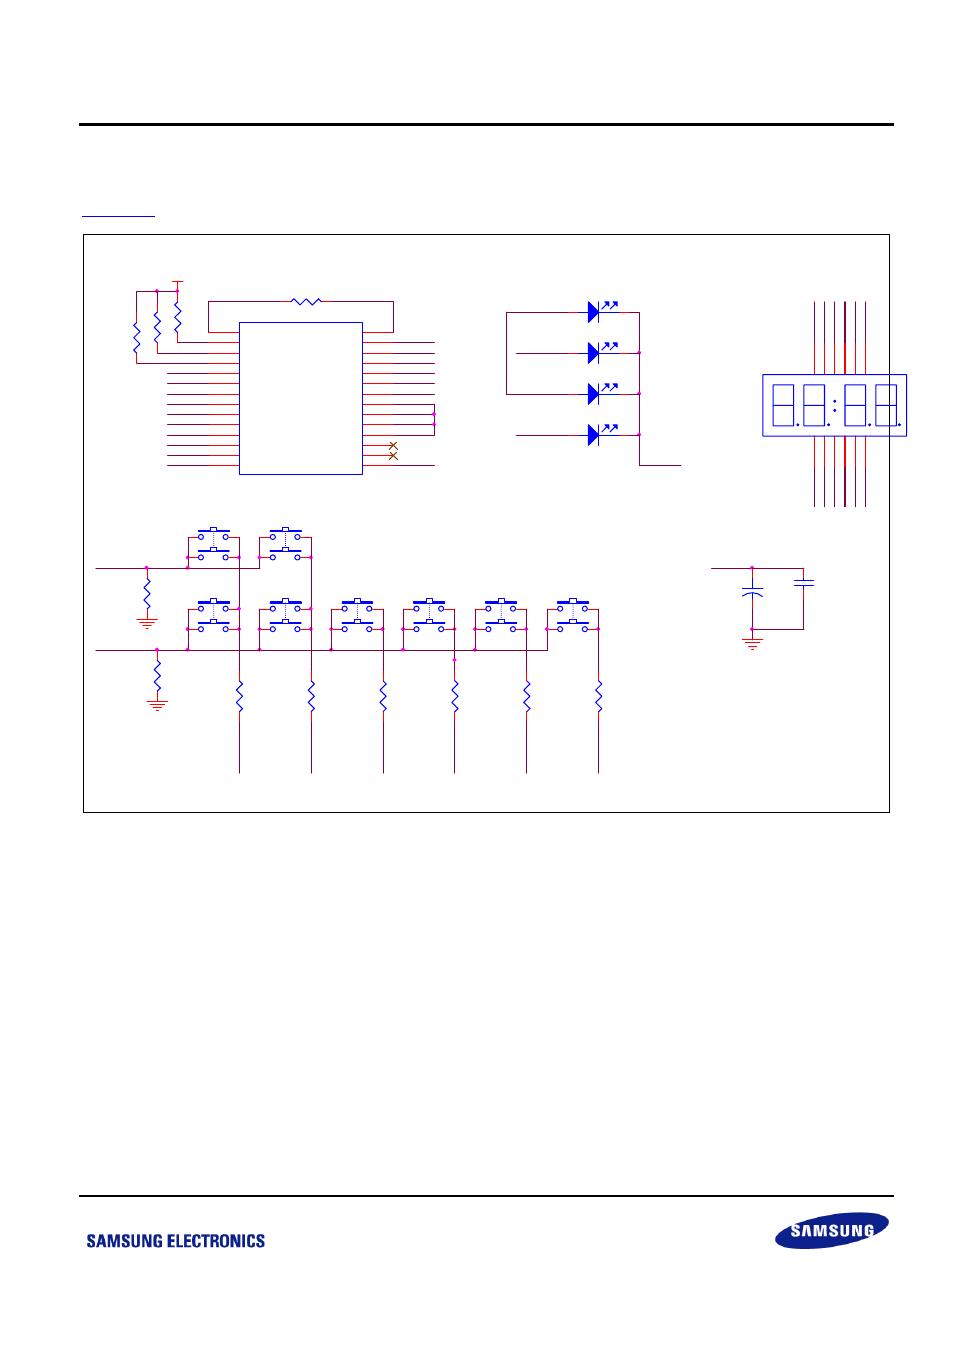 3 key and display circuit, Figure 2-9 key and display circuit | Samsung  S3F84B8 User Manual | Page 20 / 25